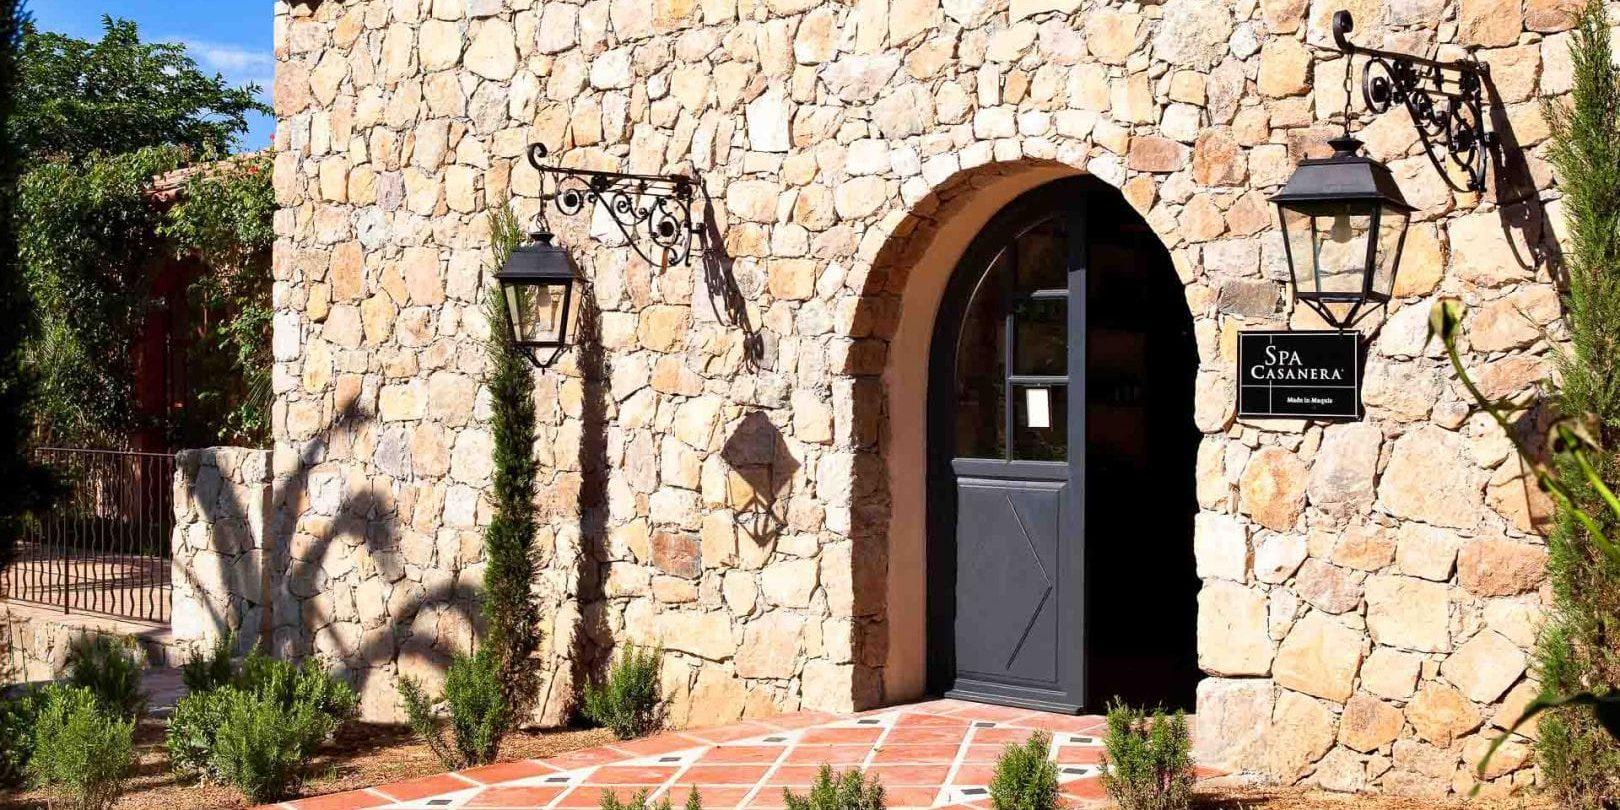 Hotel La Signoria Calvi Balagne Corsica Frankrijk spa Casanera façade entree